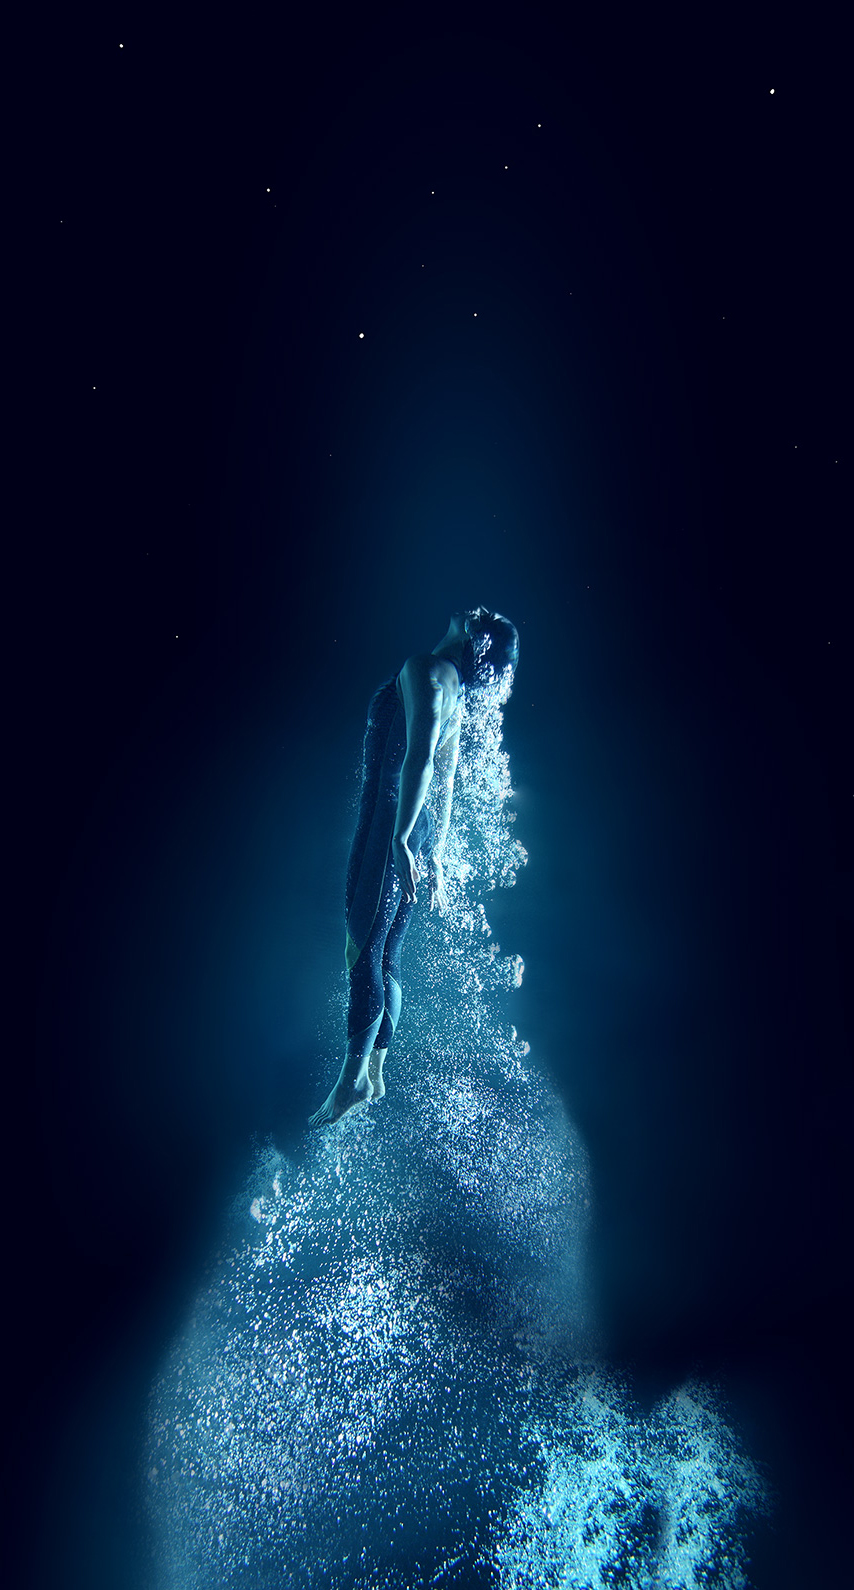 sky, dark, beautiful, moon, swimmer, girl, ice